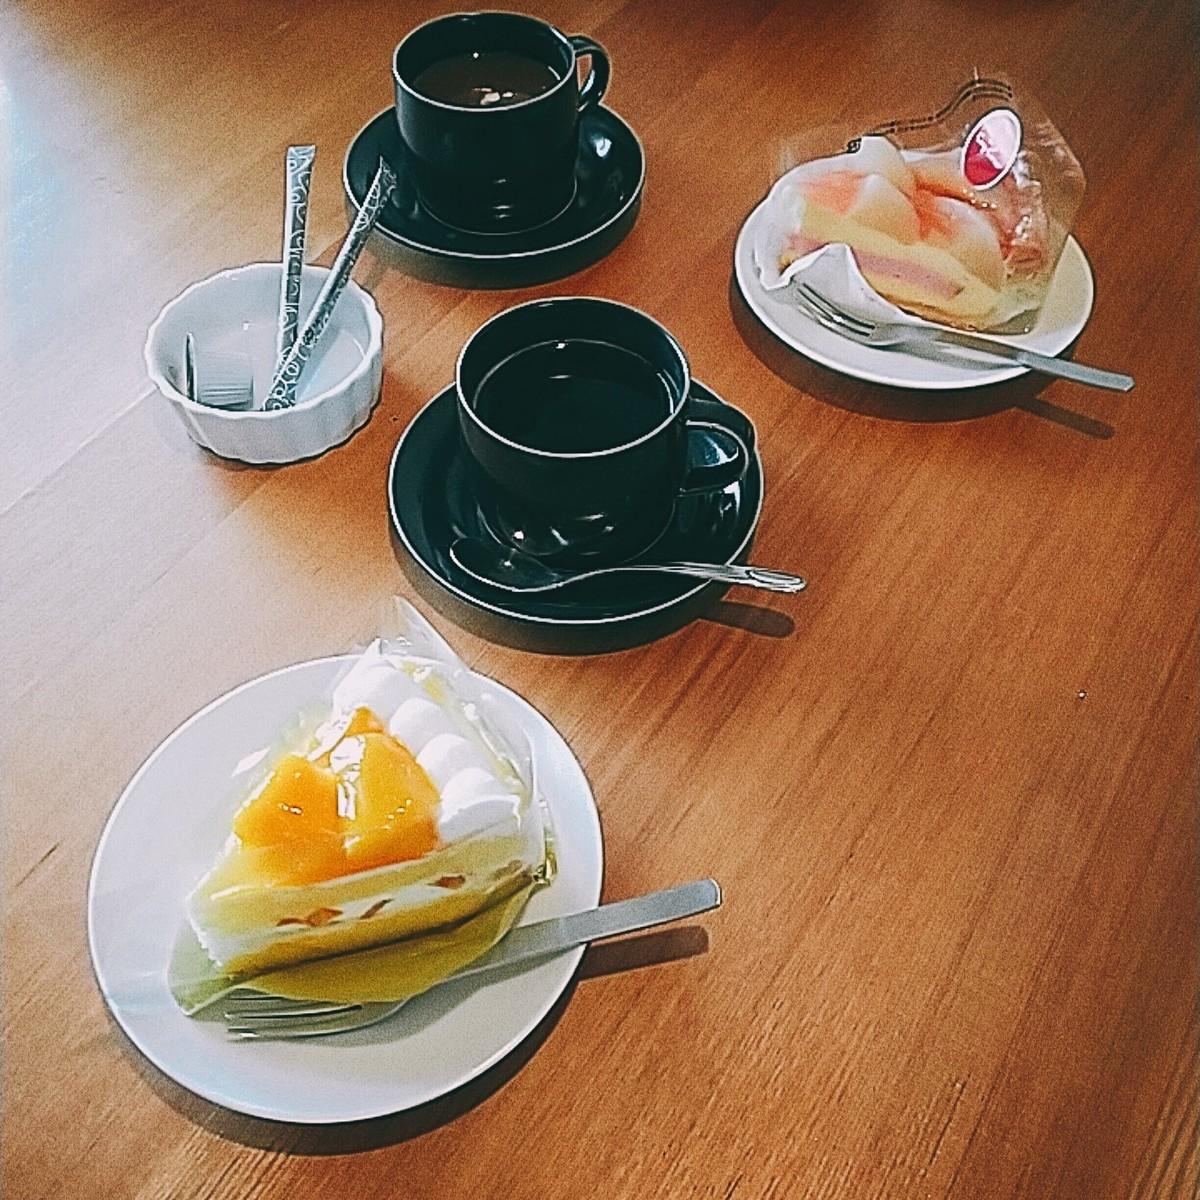 f:id:yusei2000:20210630153153j:plain